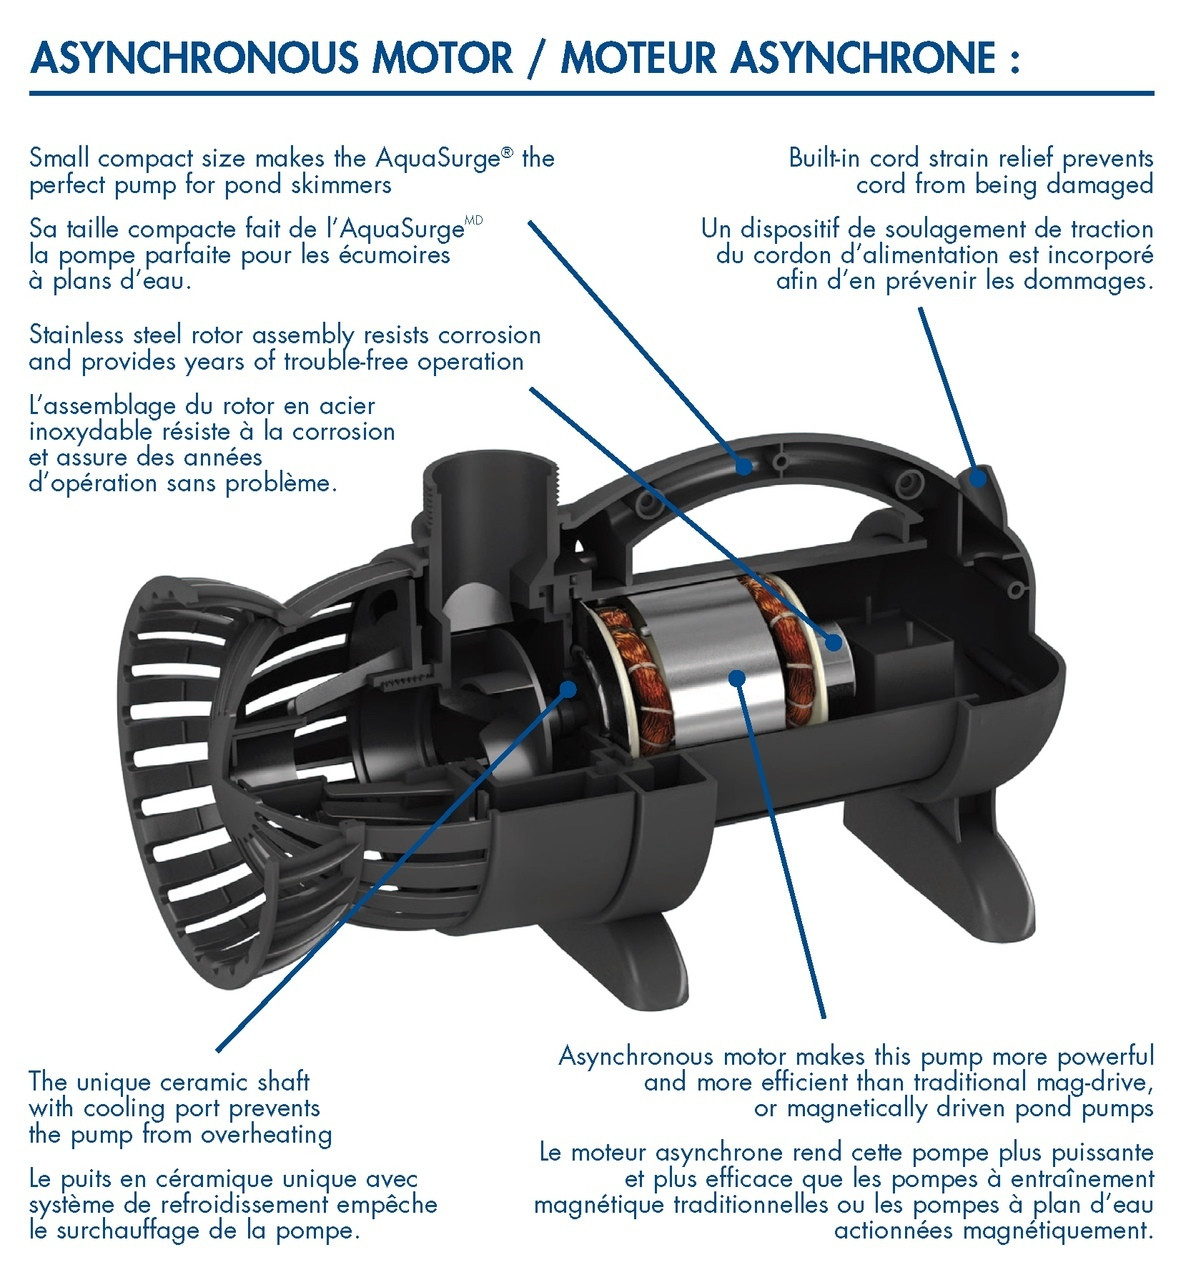 Aquascape Aquasurge 5000 Pump 20000lph Diymegastore Com Au